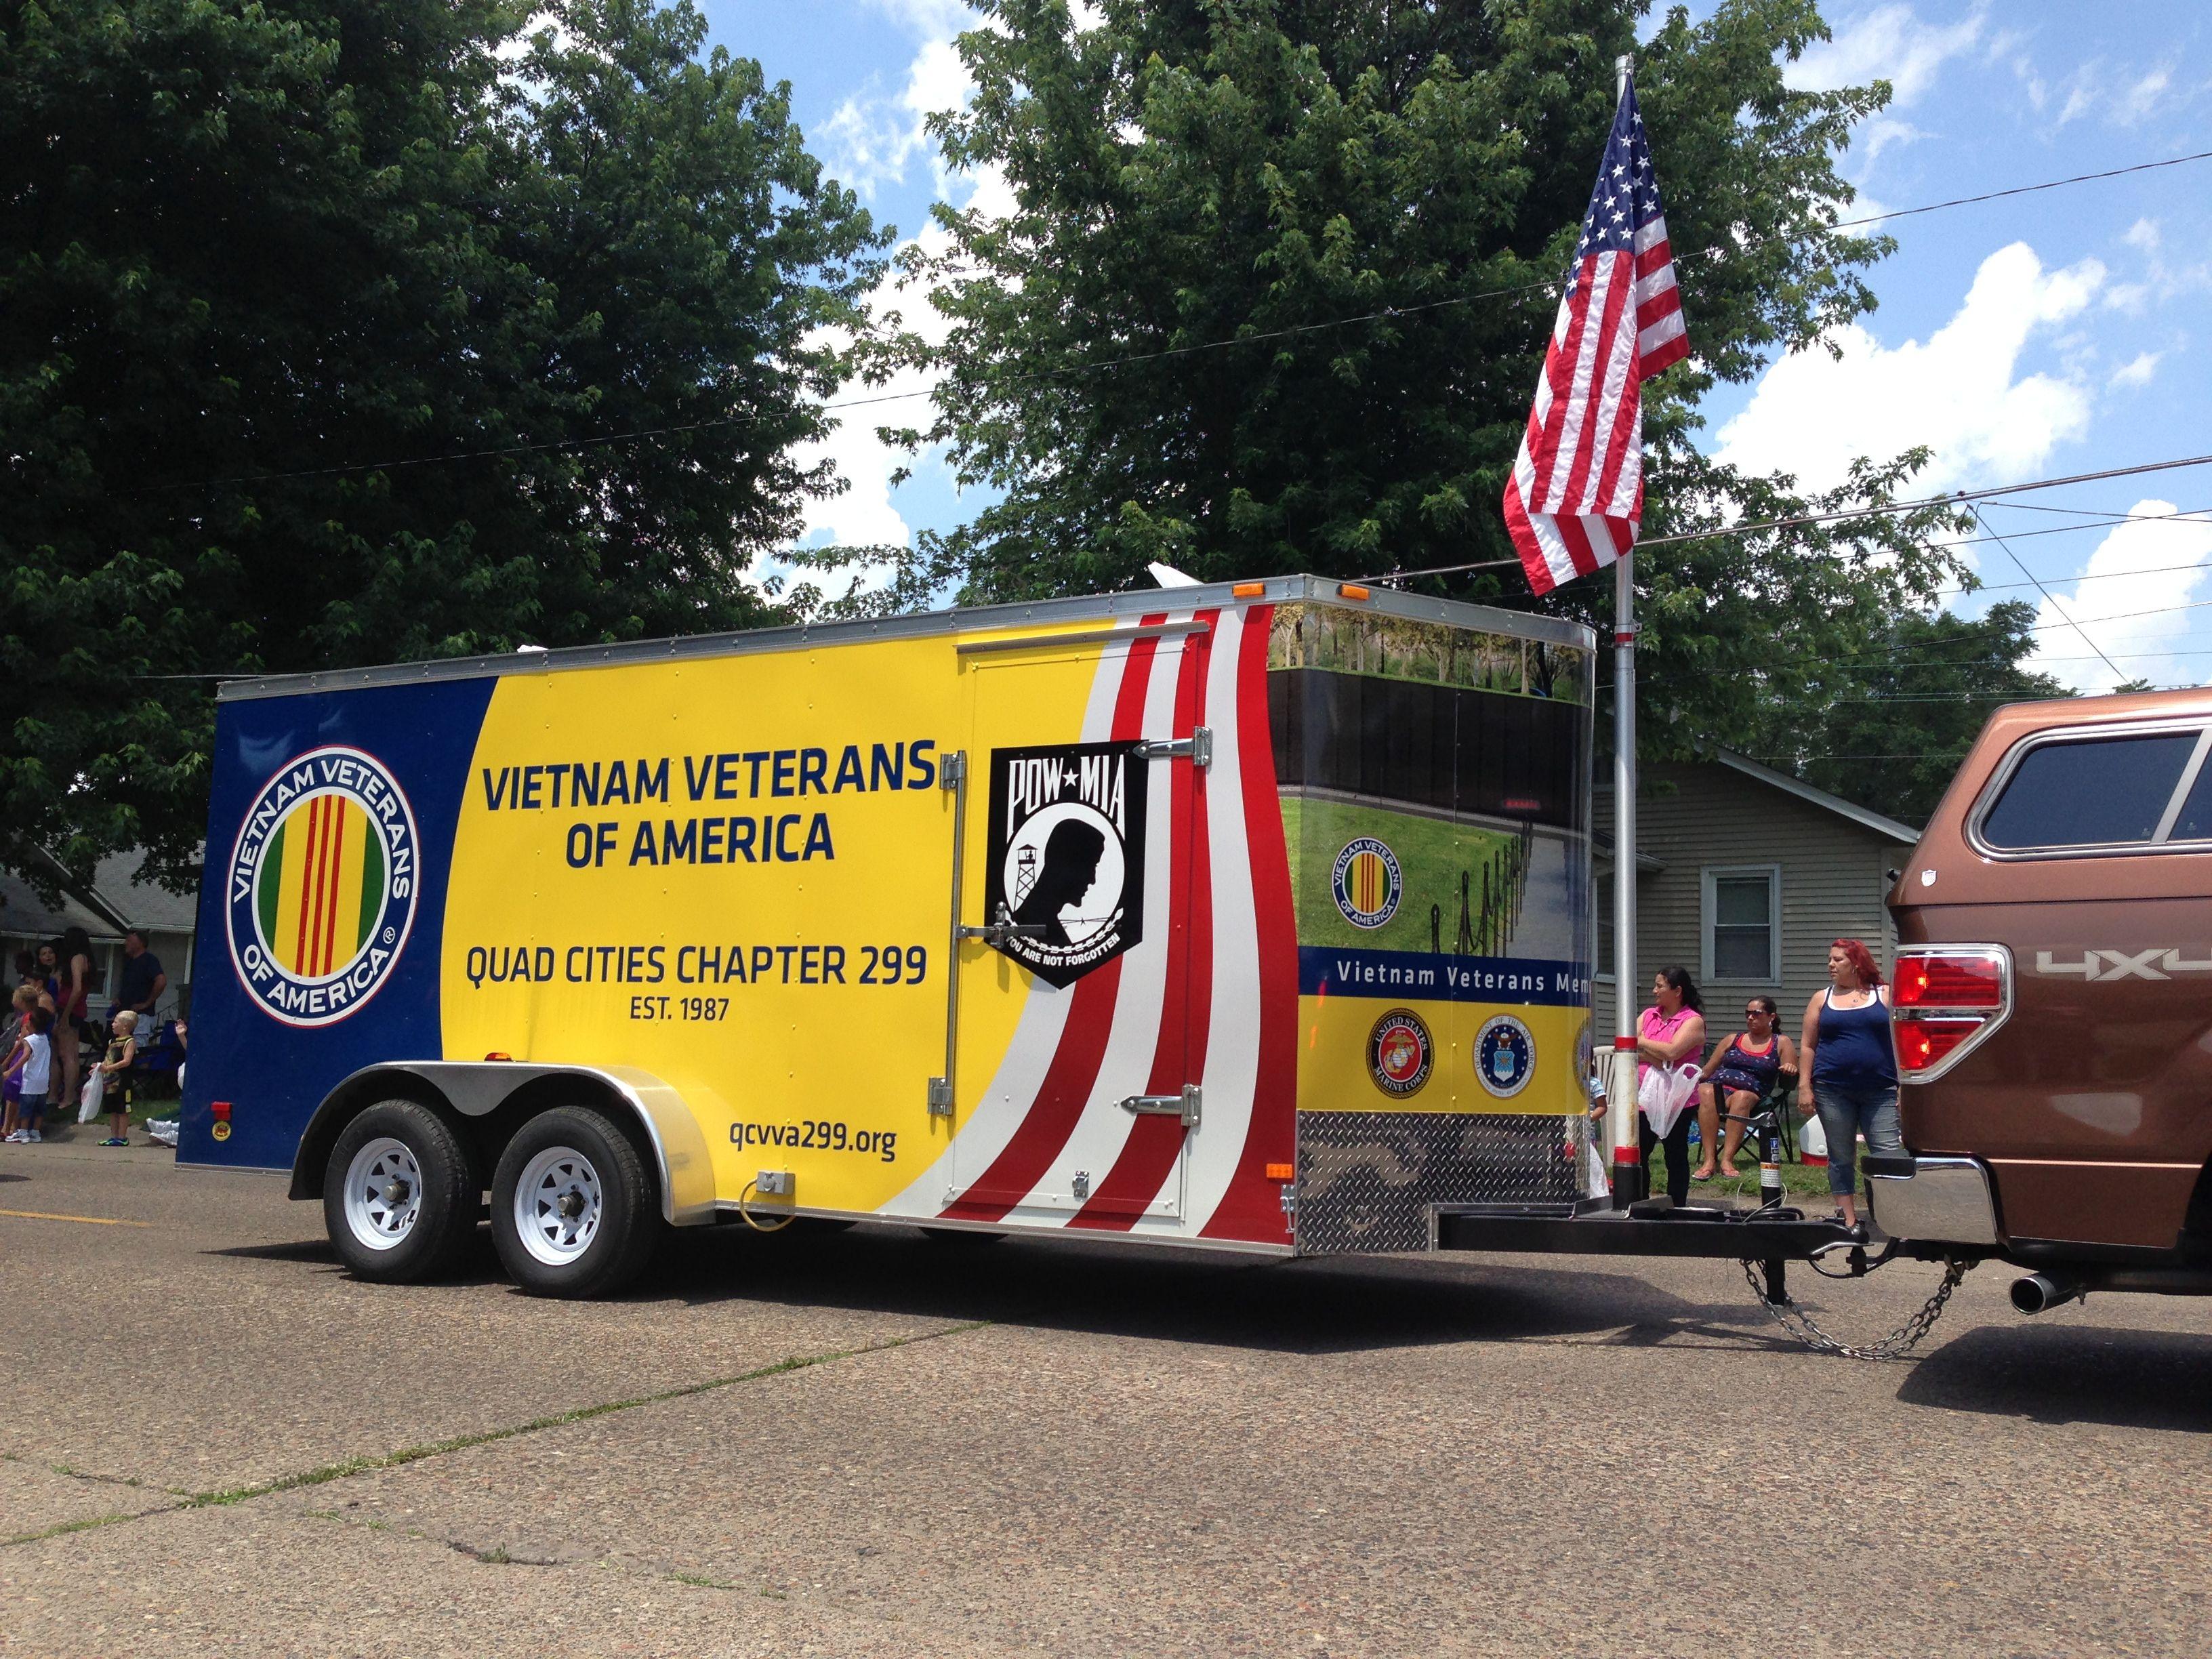 Vietnam Veterans Trailer Wrap Vietnam veterans, Quad